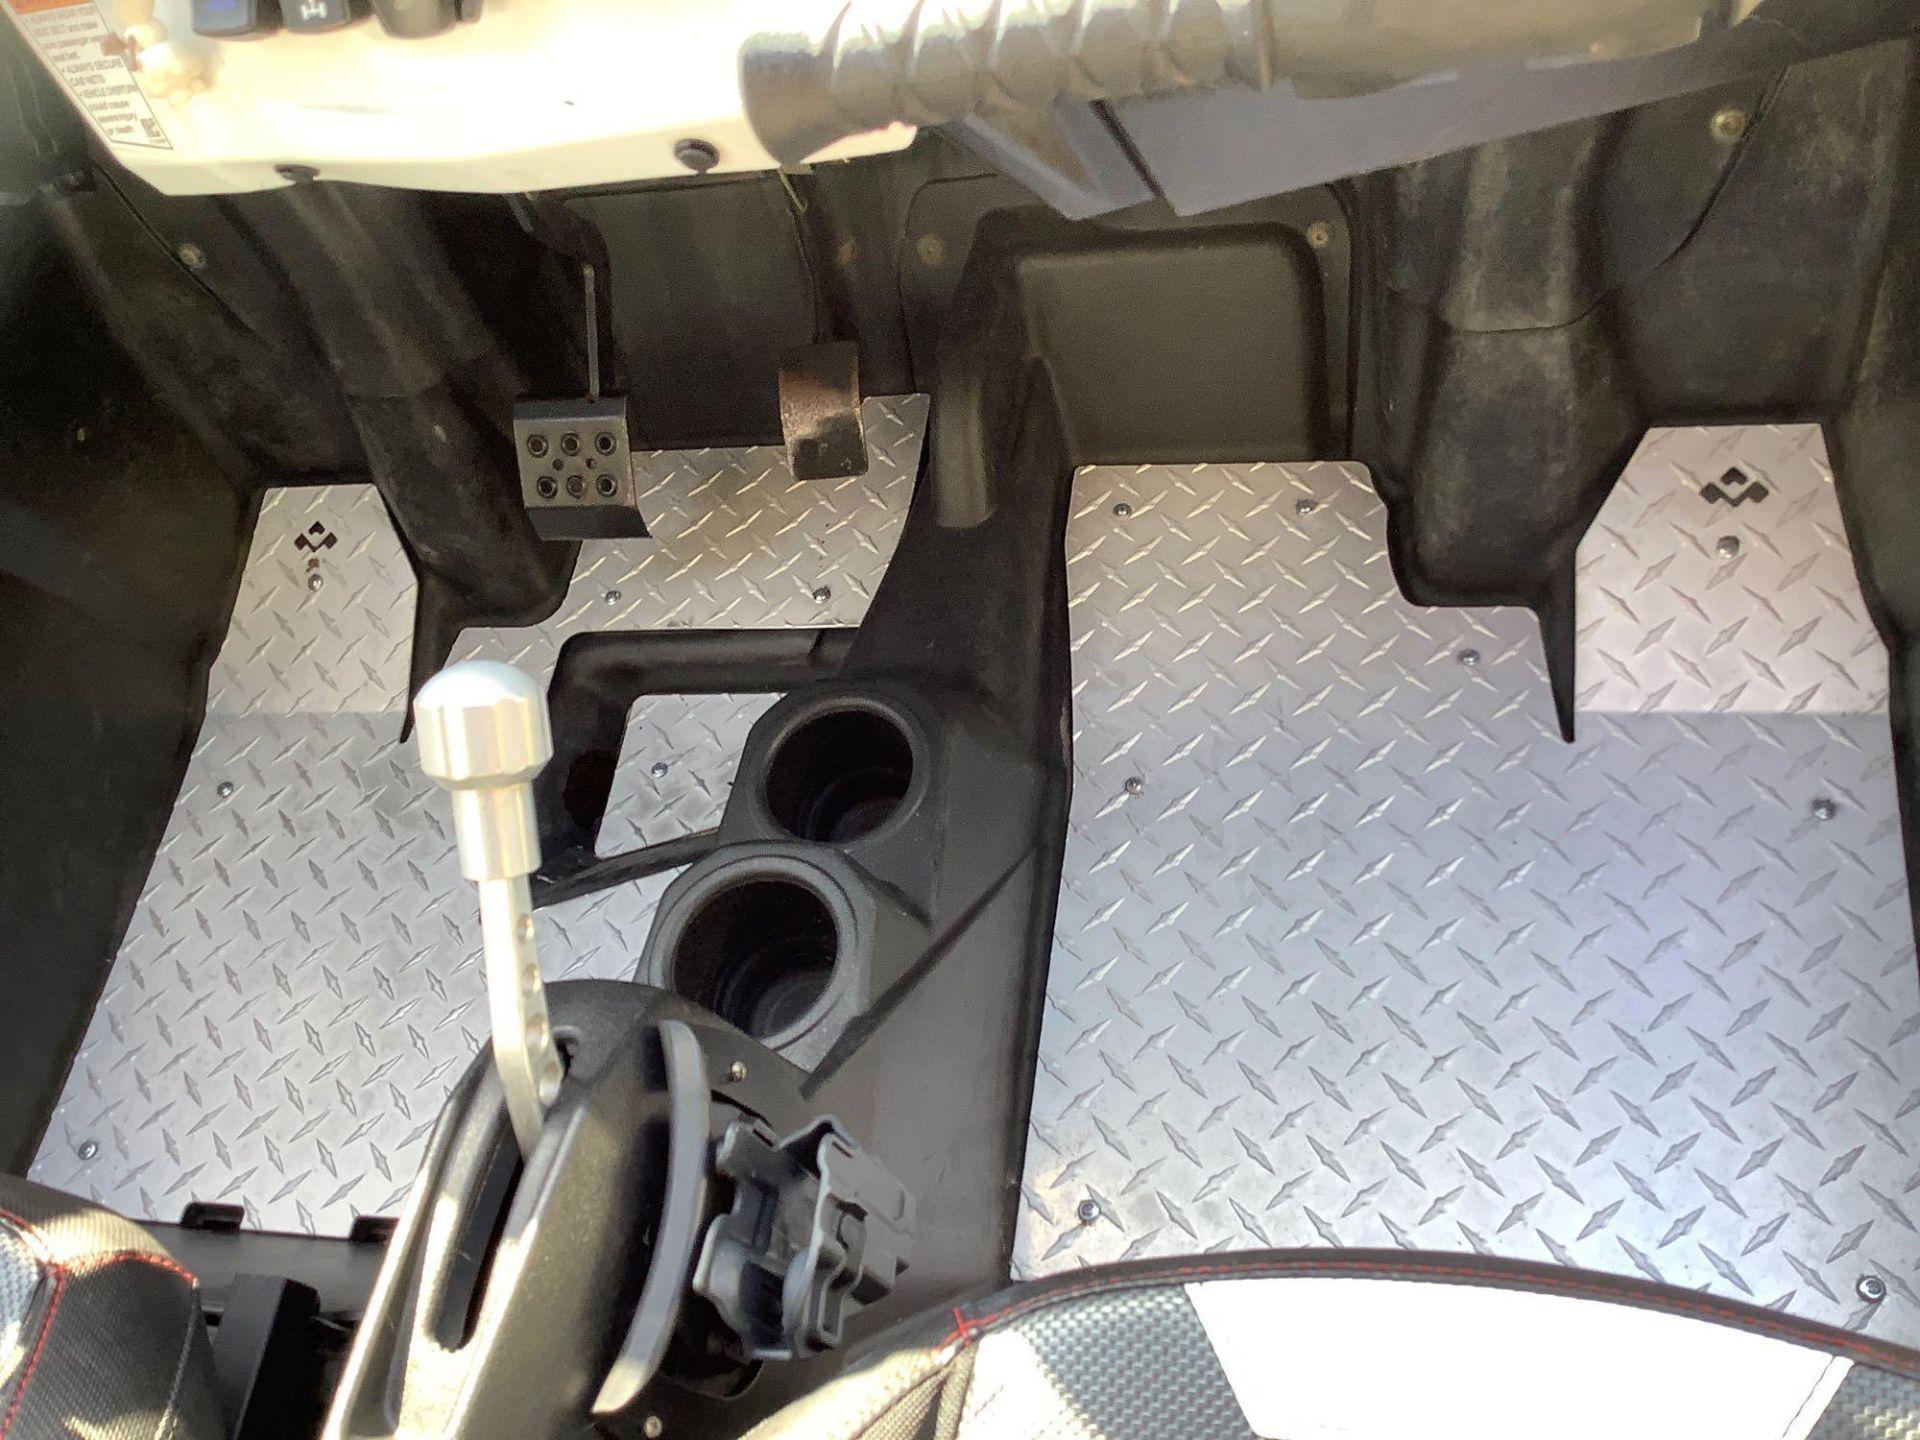 POLARIS RANGER RZR XP 900, TRINITY STAGE 5 RACING MUFFLER, SNORKEL INTAKE, CRUNCH 900 WATTS AMPLIFY - Image 19 of 22